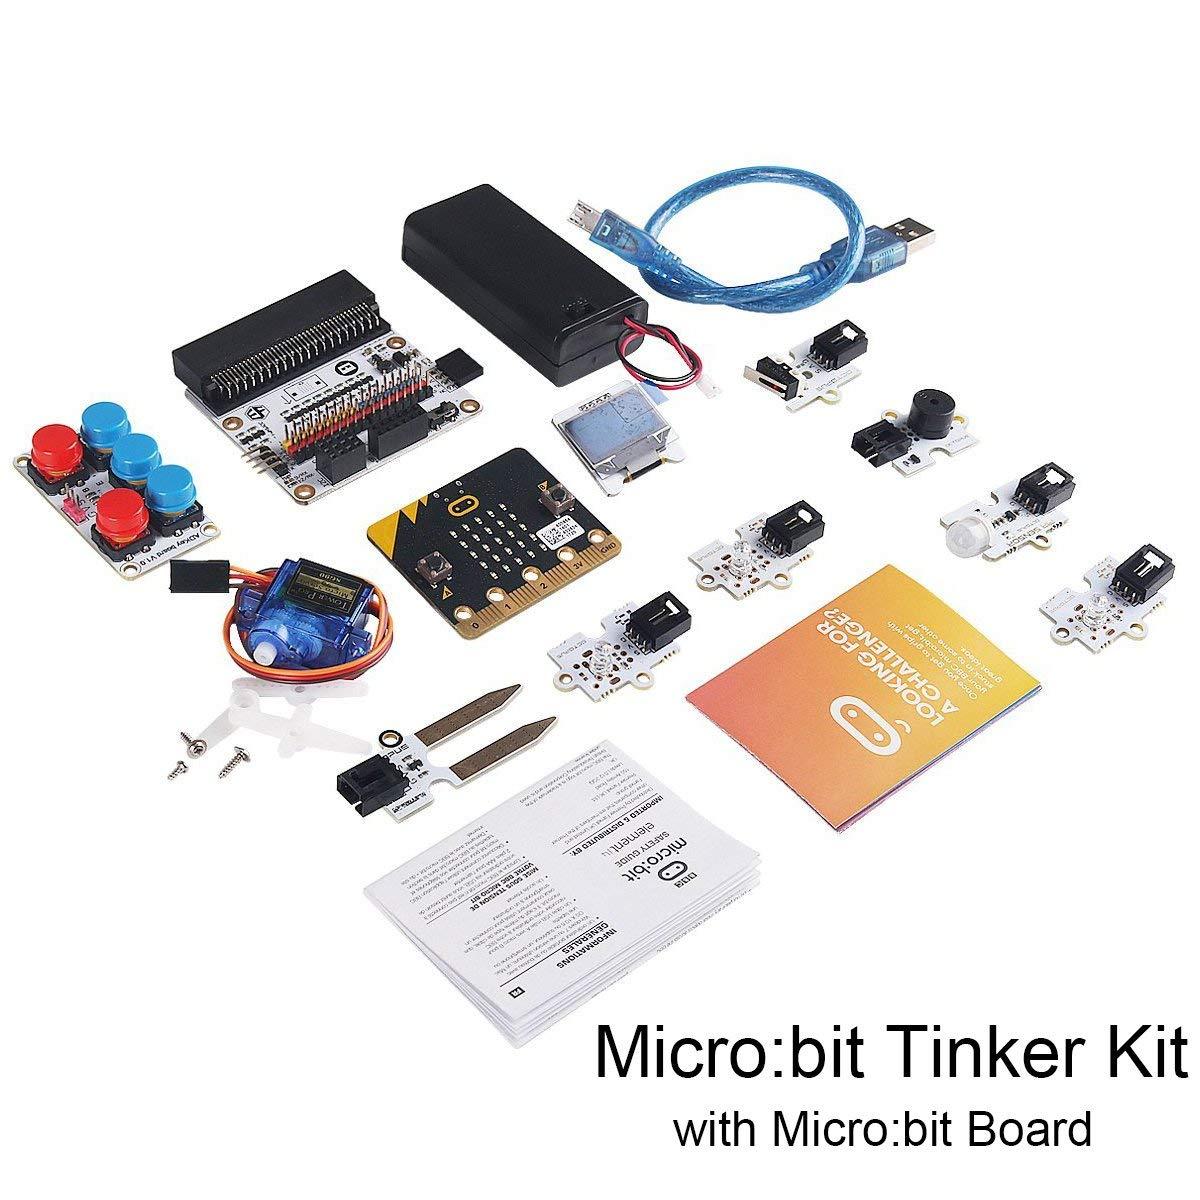 Micro:bit Tinker Kit w/Micro:bit Board, Include Micro:bit Breakout Board, OCTOPUS PIR Sensor Module for Classroom Teaching and DIY Beginners